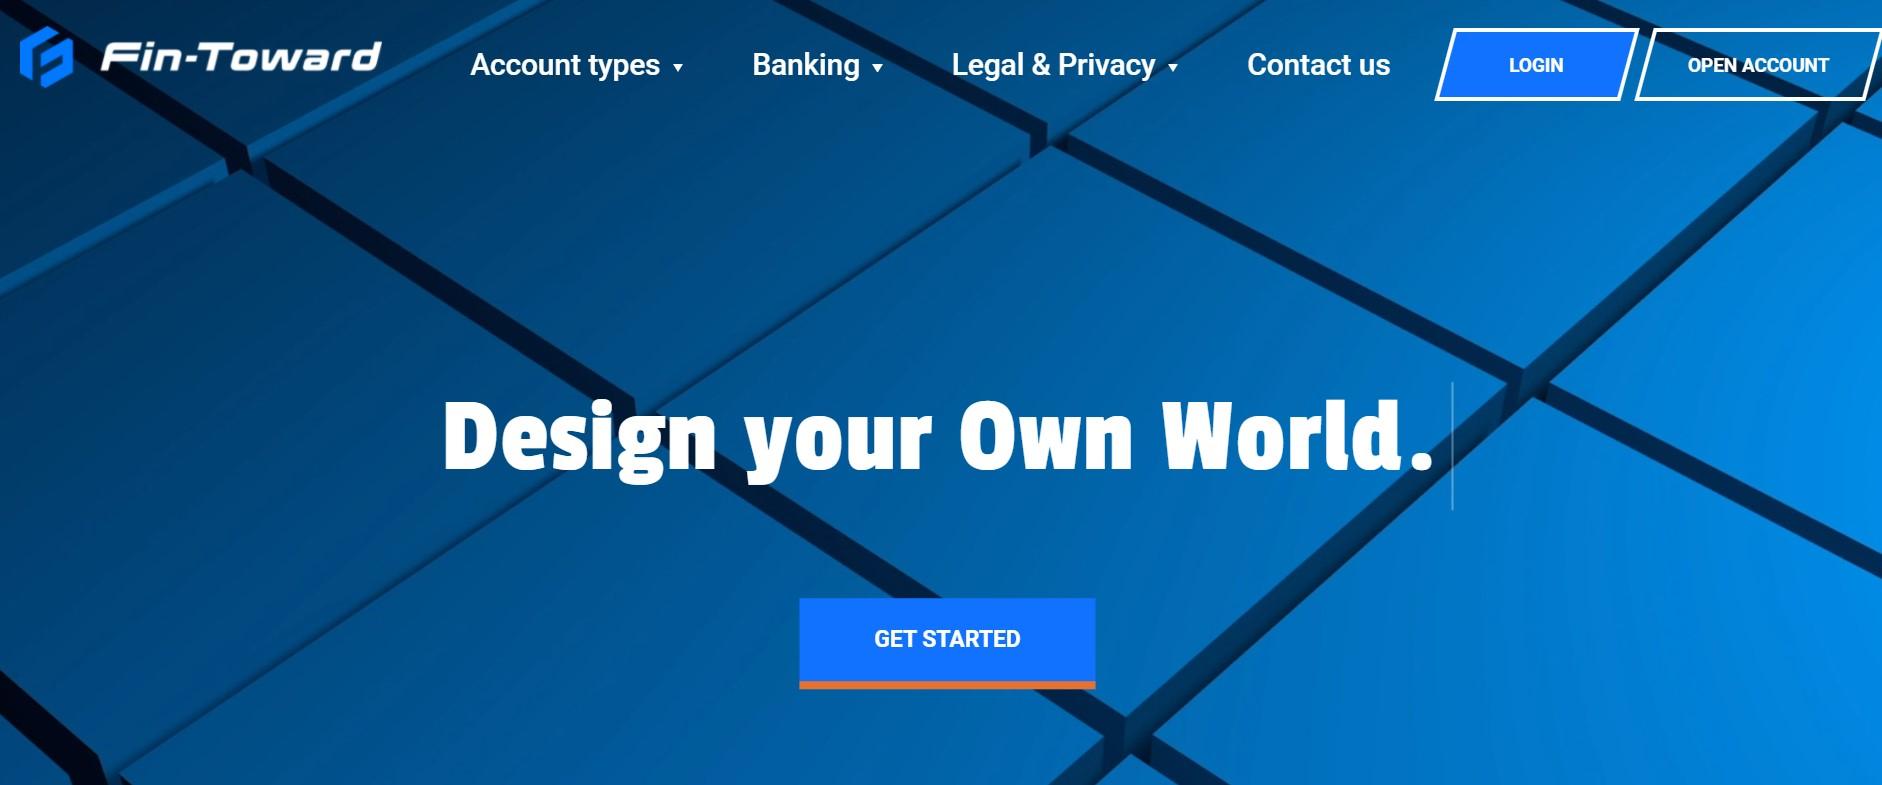 Fin-Toward website